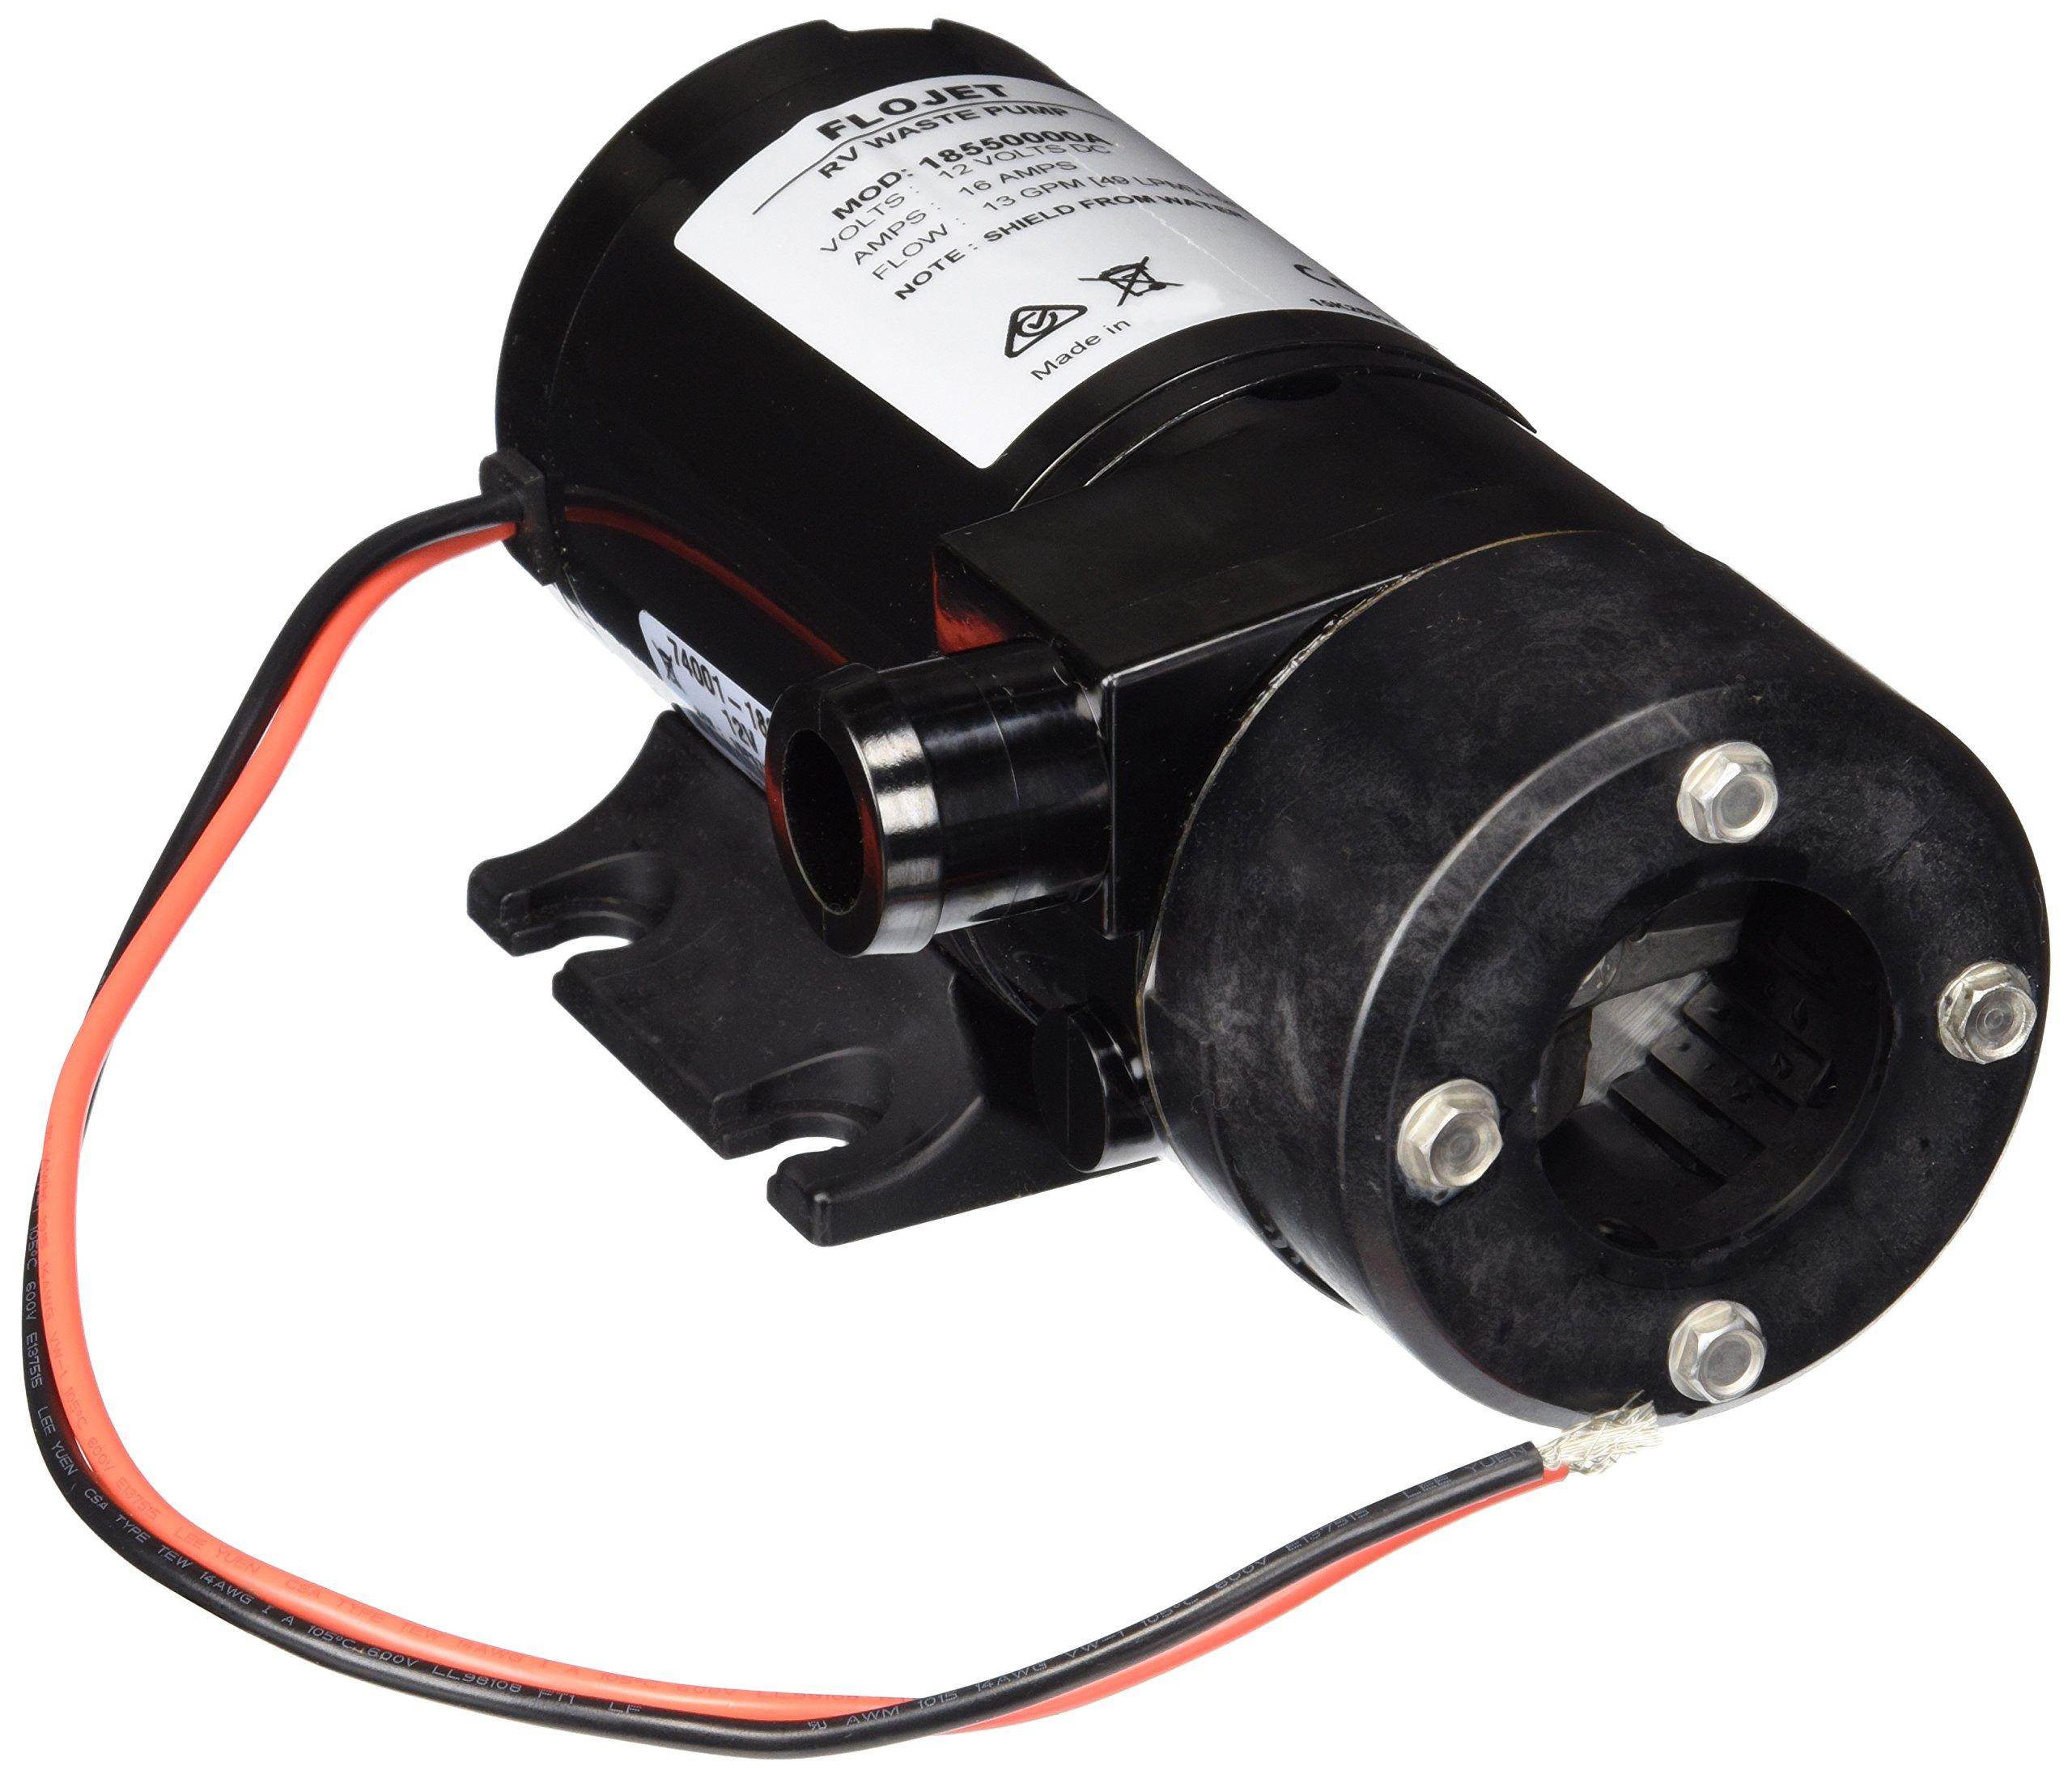 Flojet 18550000A 13 GPM RV Macerator Pump by Flojet